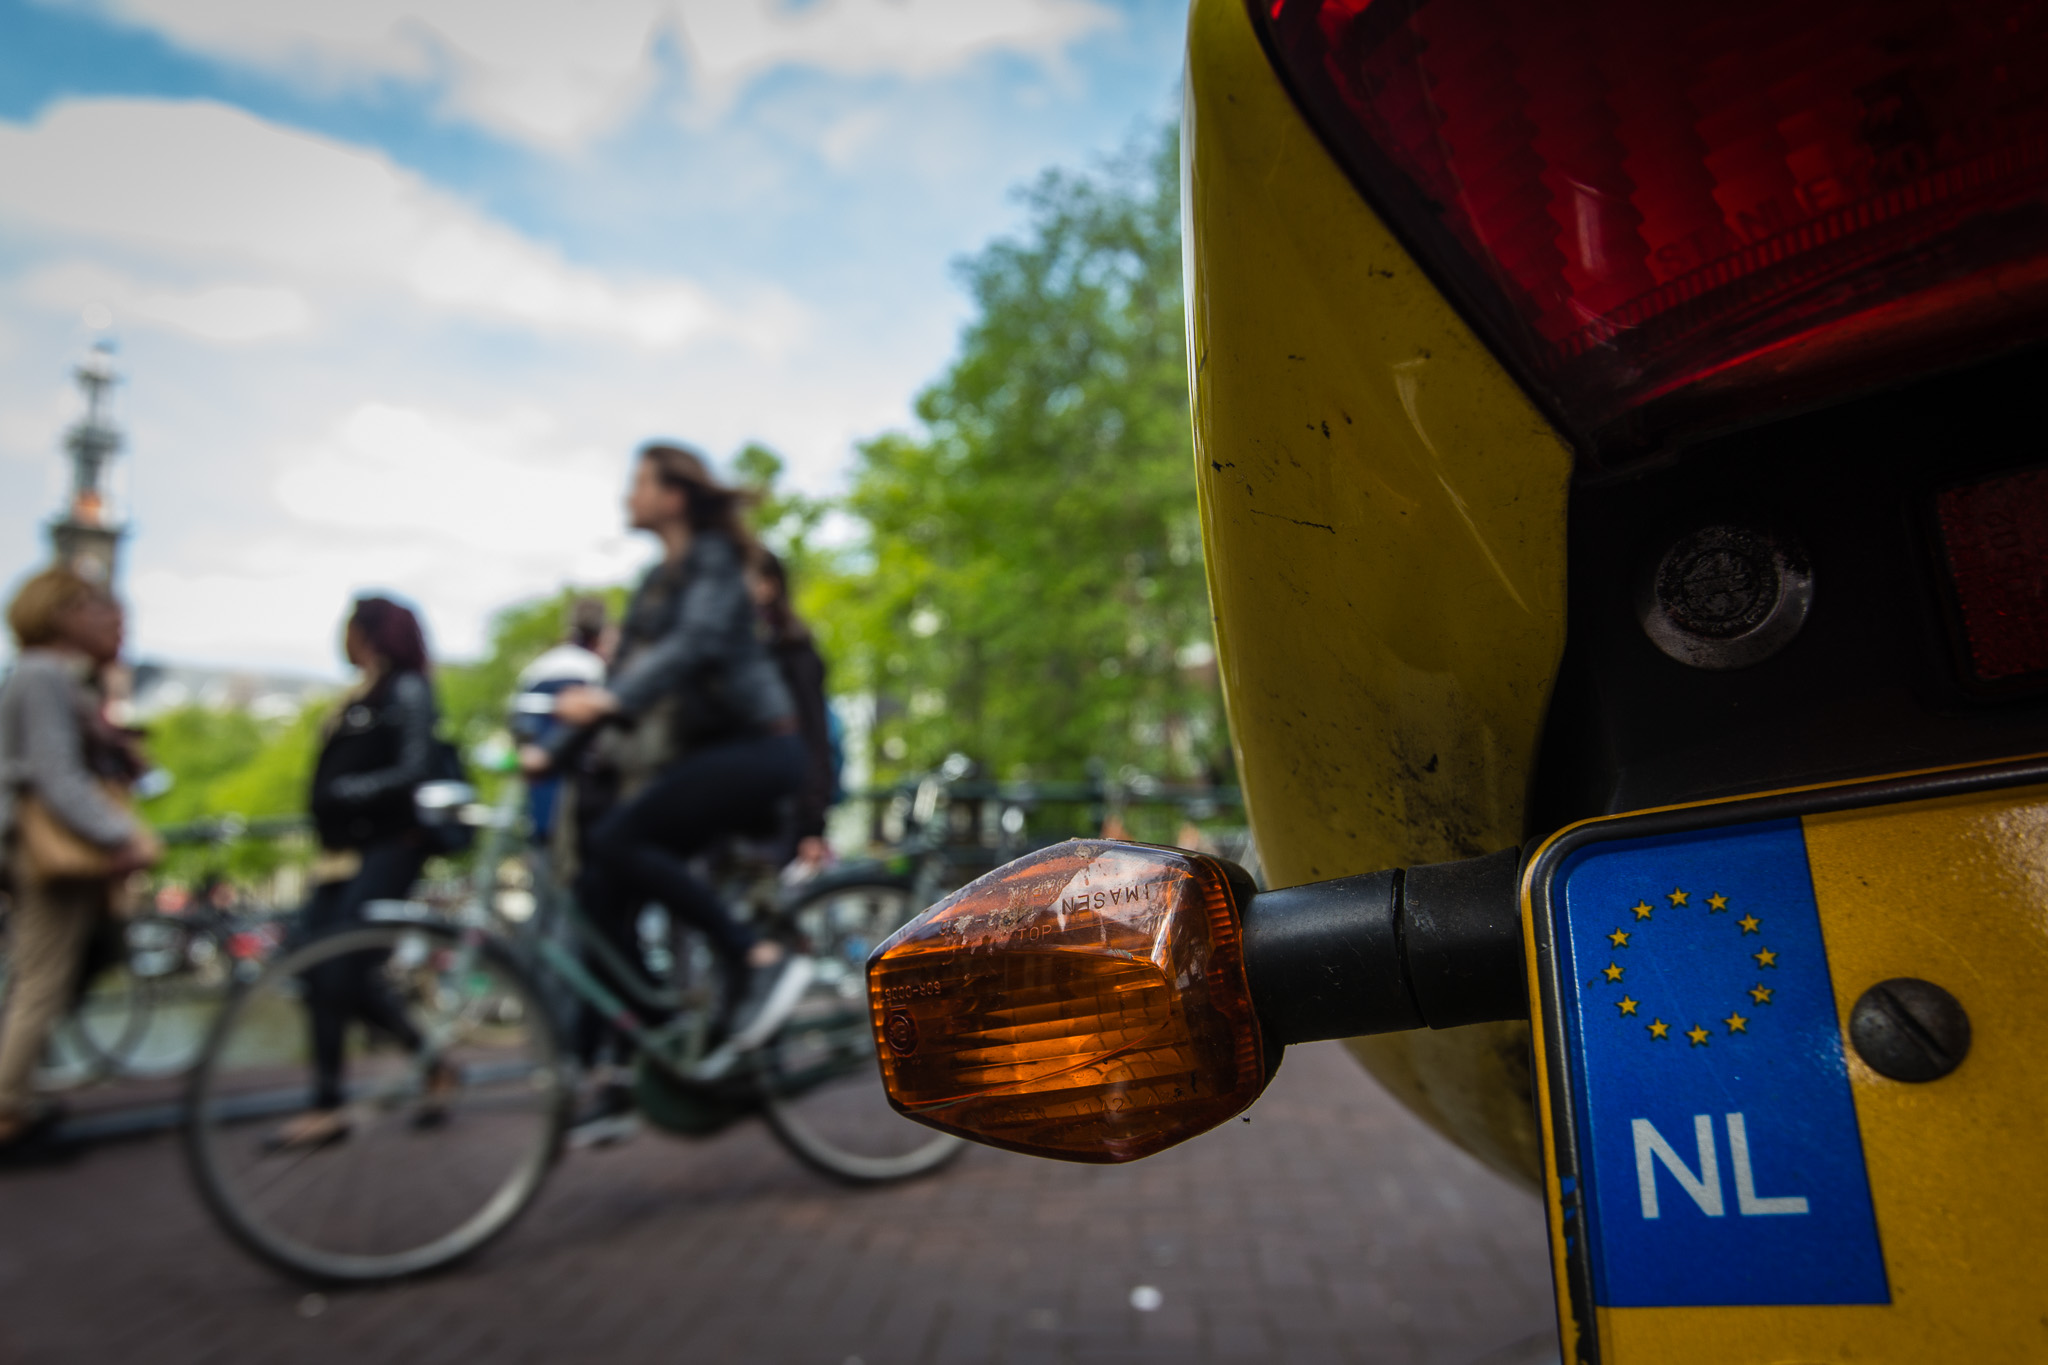 Nizozemsko, poznávací značka, SPZ, EU, Evropská unie---Netherlands, vehicle registration plate, EU, European Union